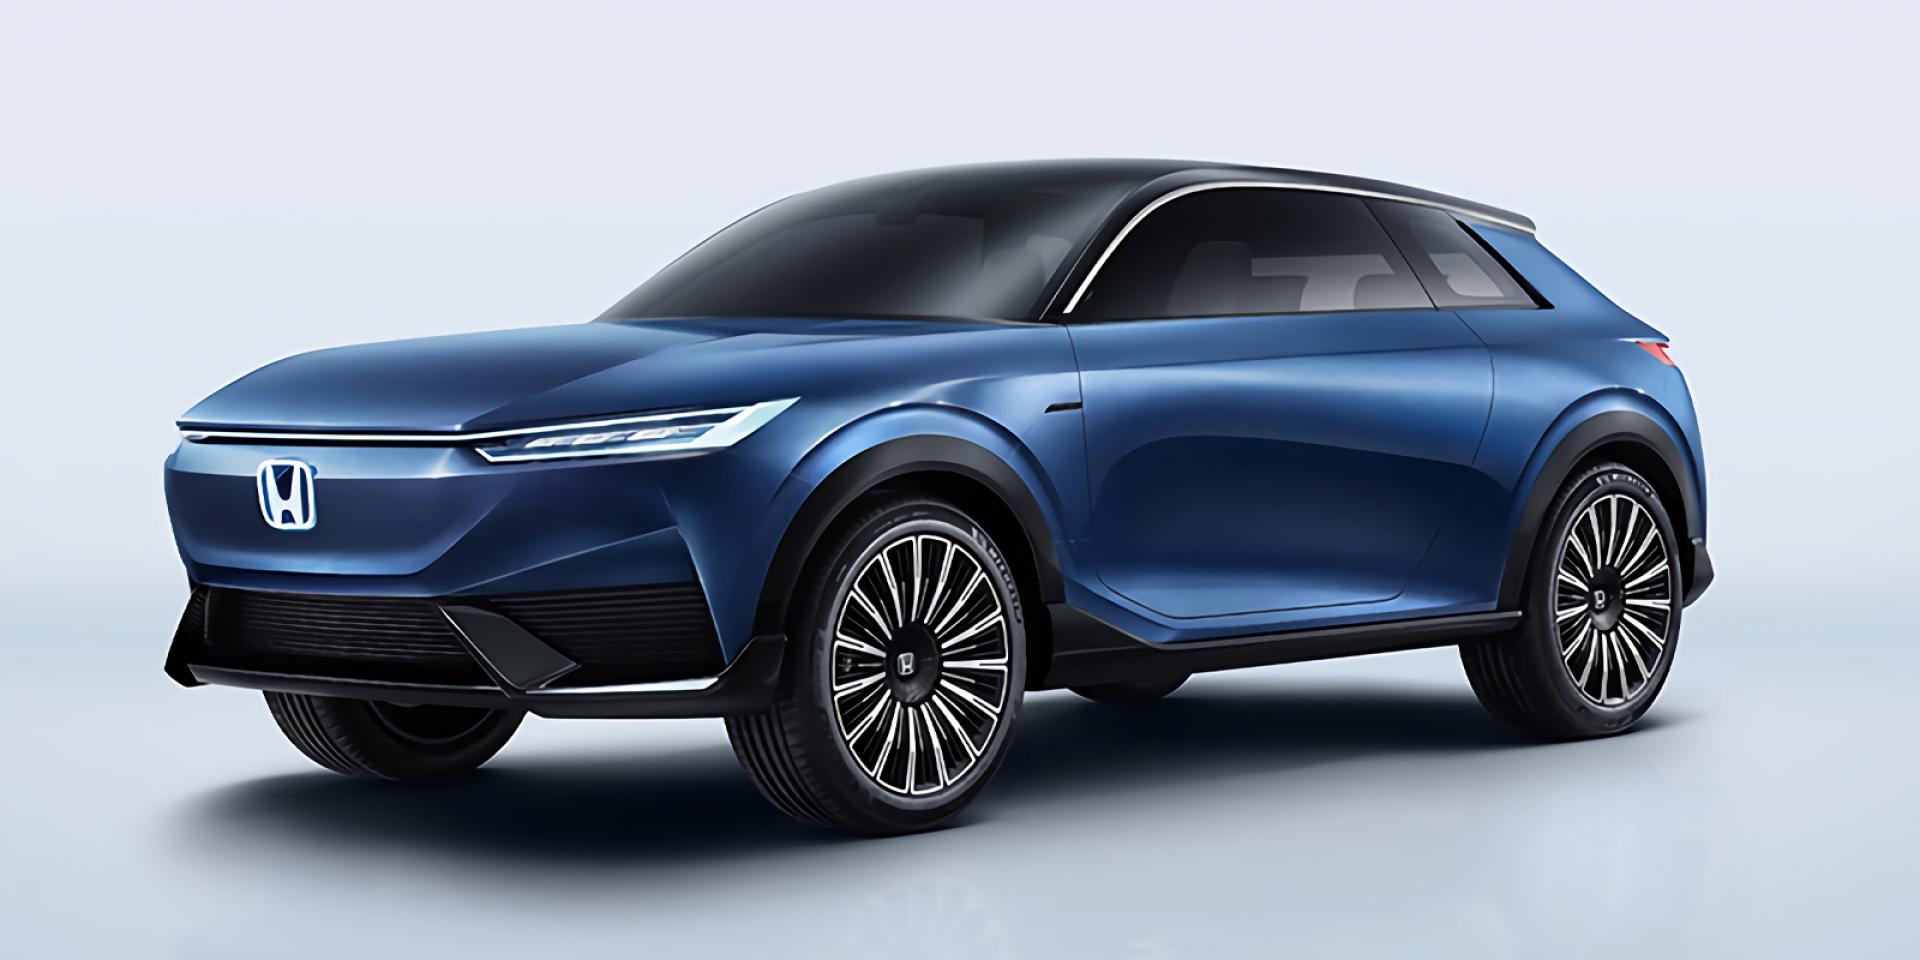 純電SUV概念現身。Honda SUV e:concept、CR-V PHEV北京車展亮相